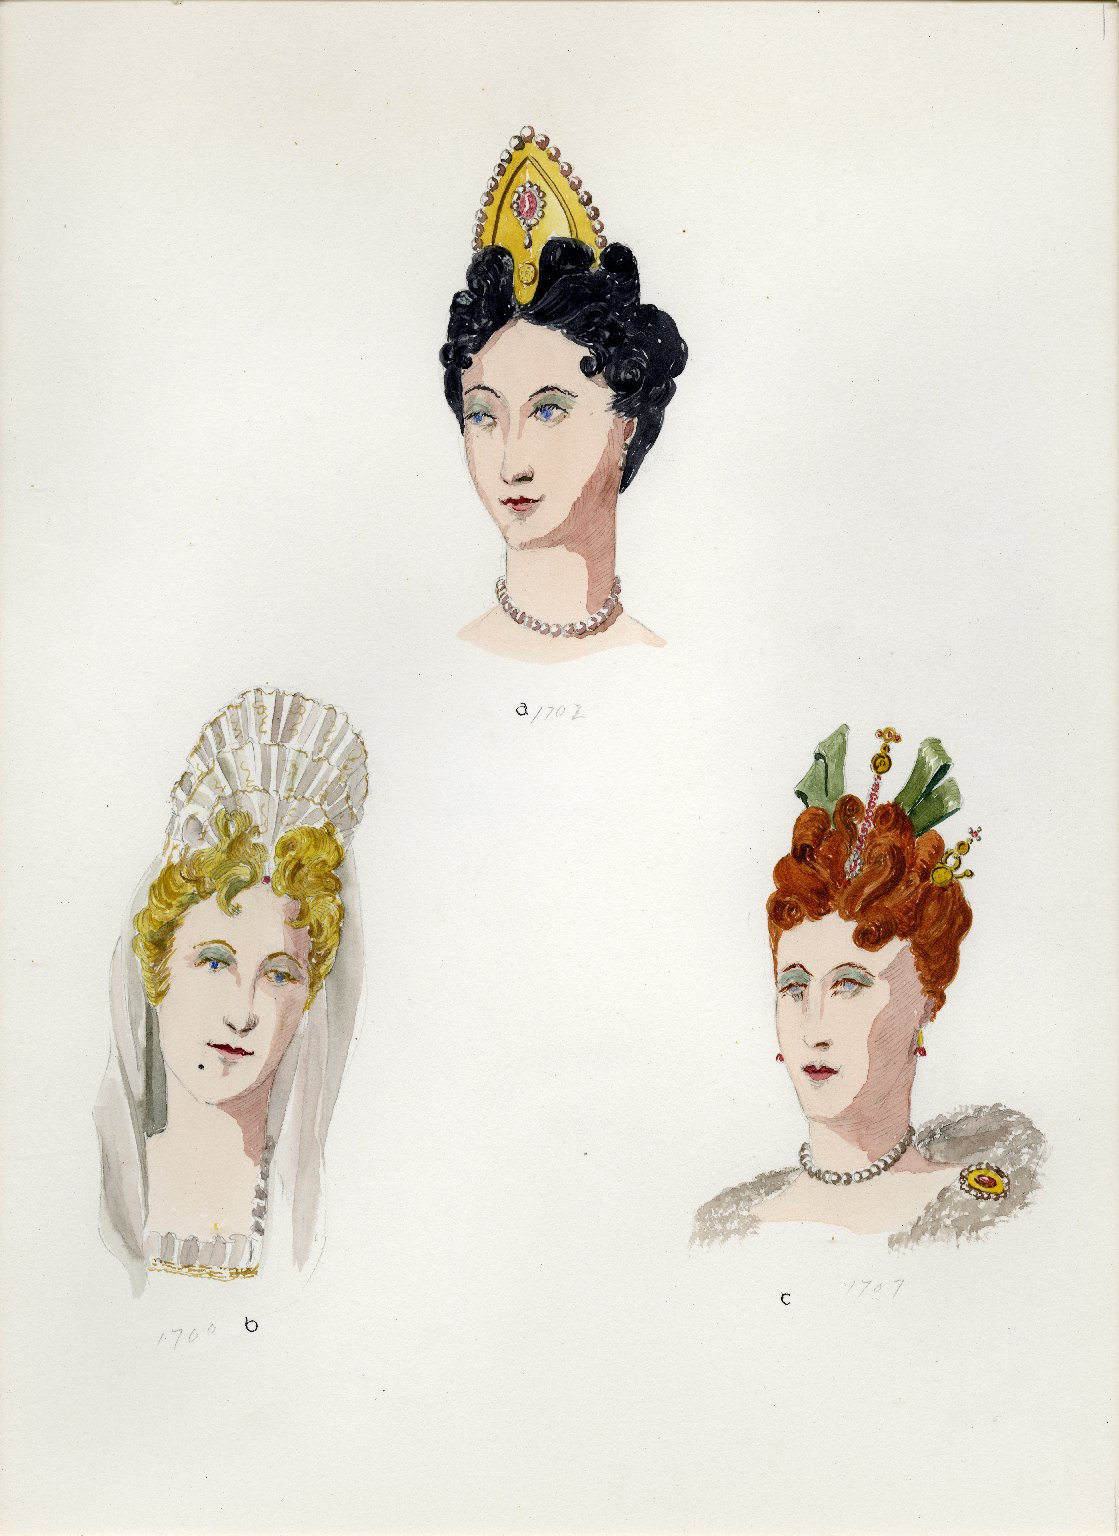 Plate IX: 18th Century French coiffure, headdress, coiffure